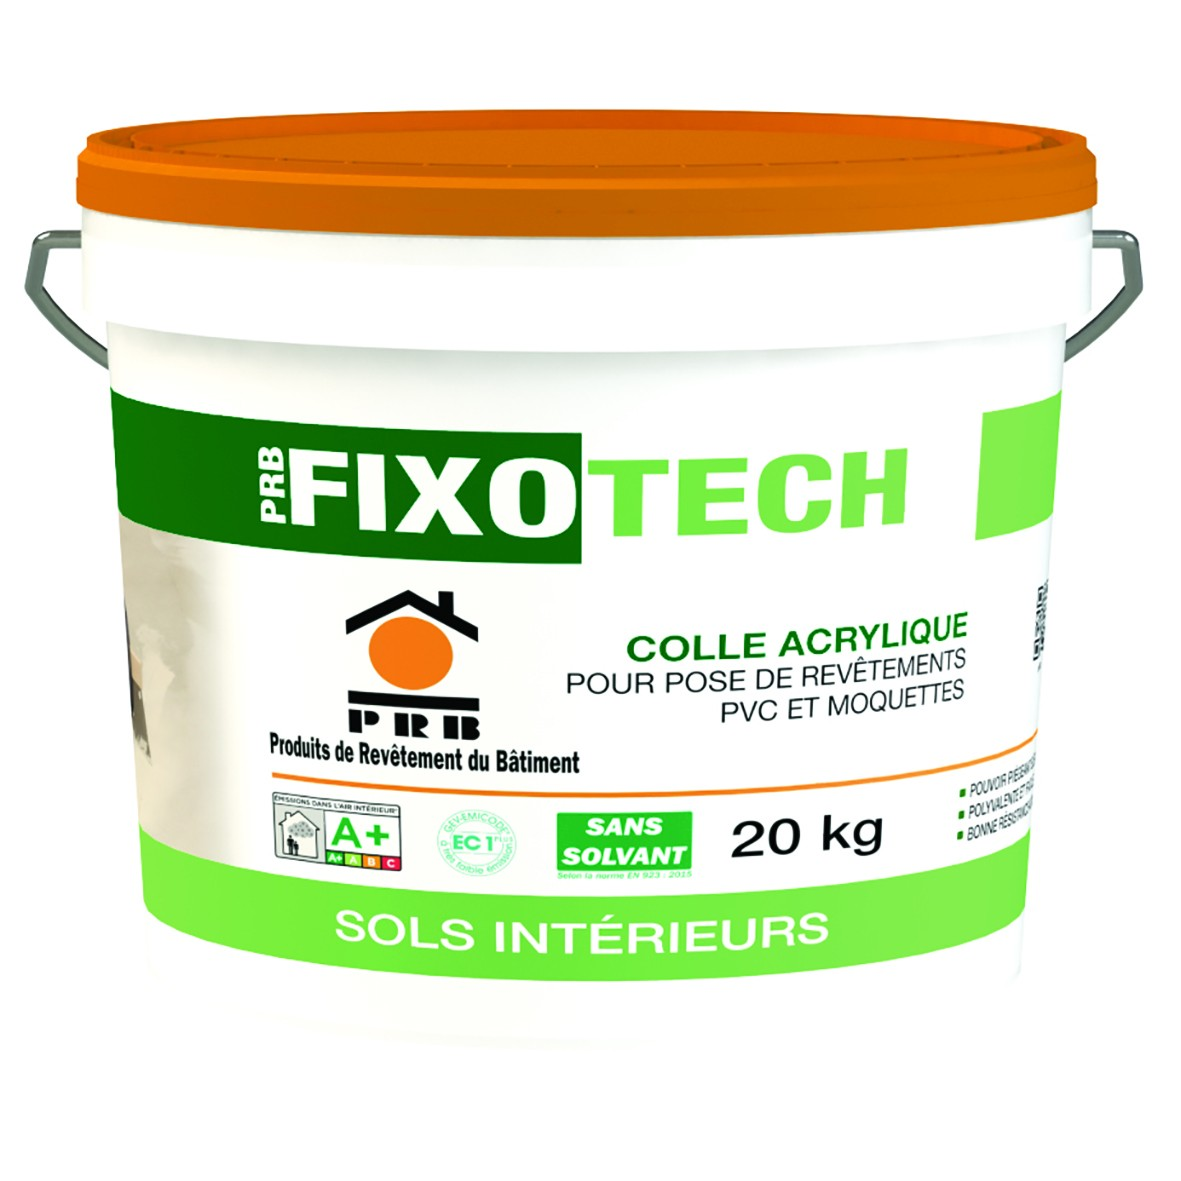 PRB FIXOTECH 20 KG